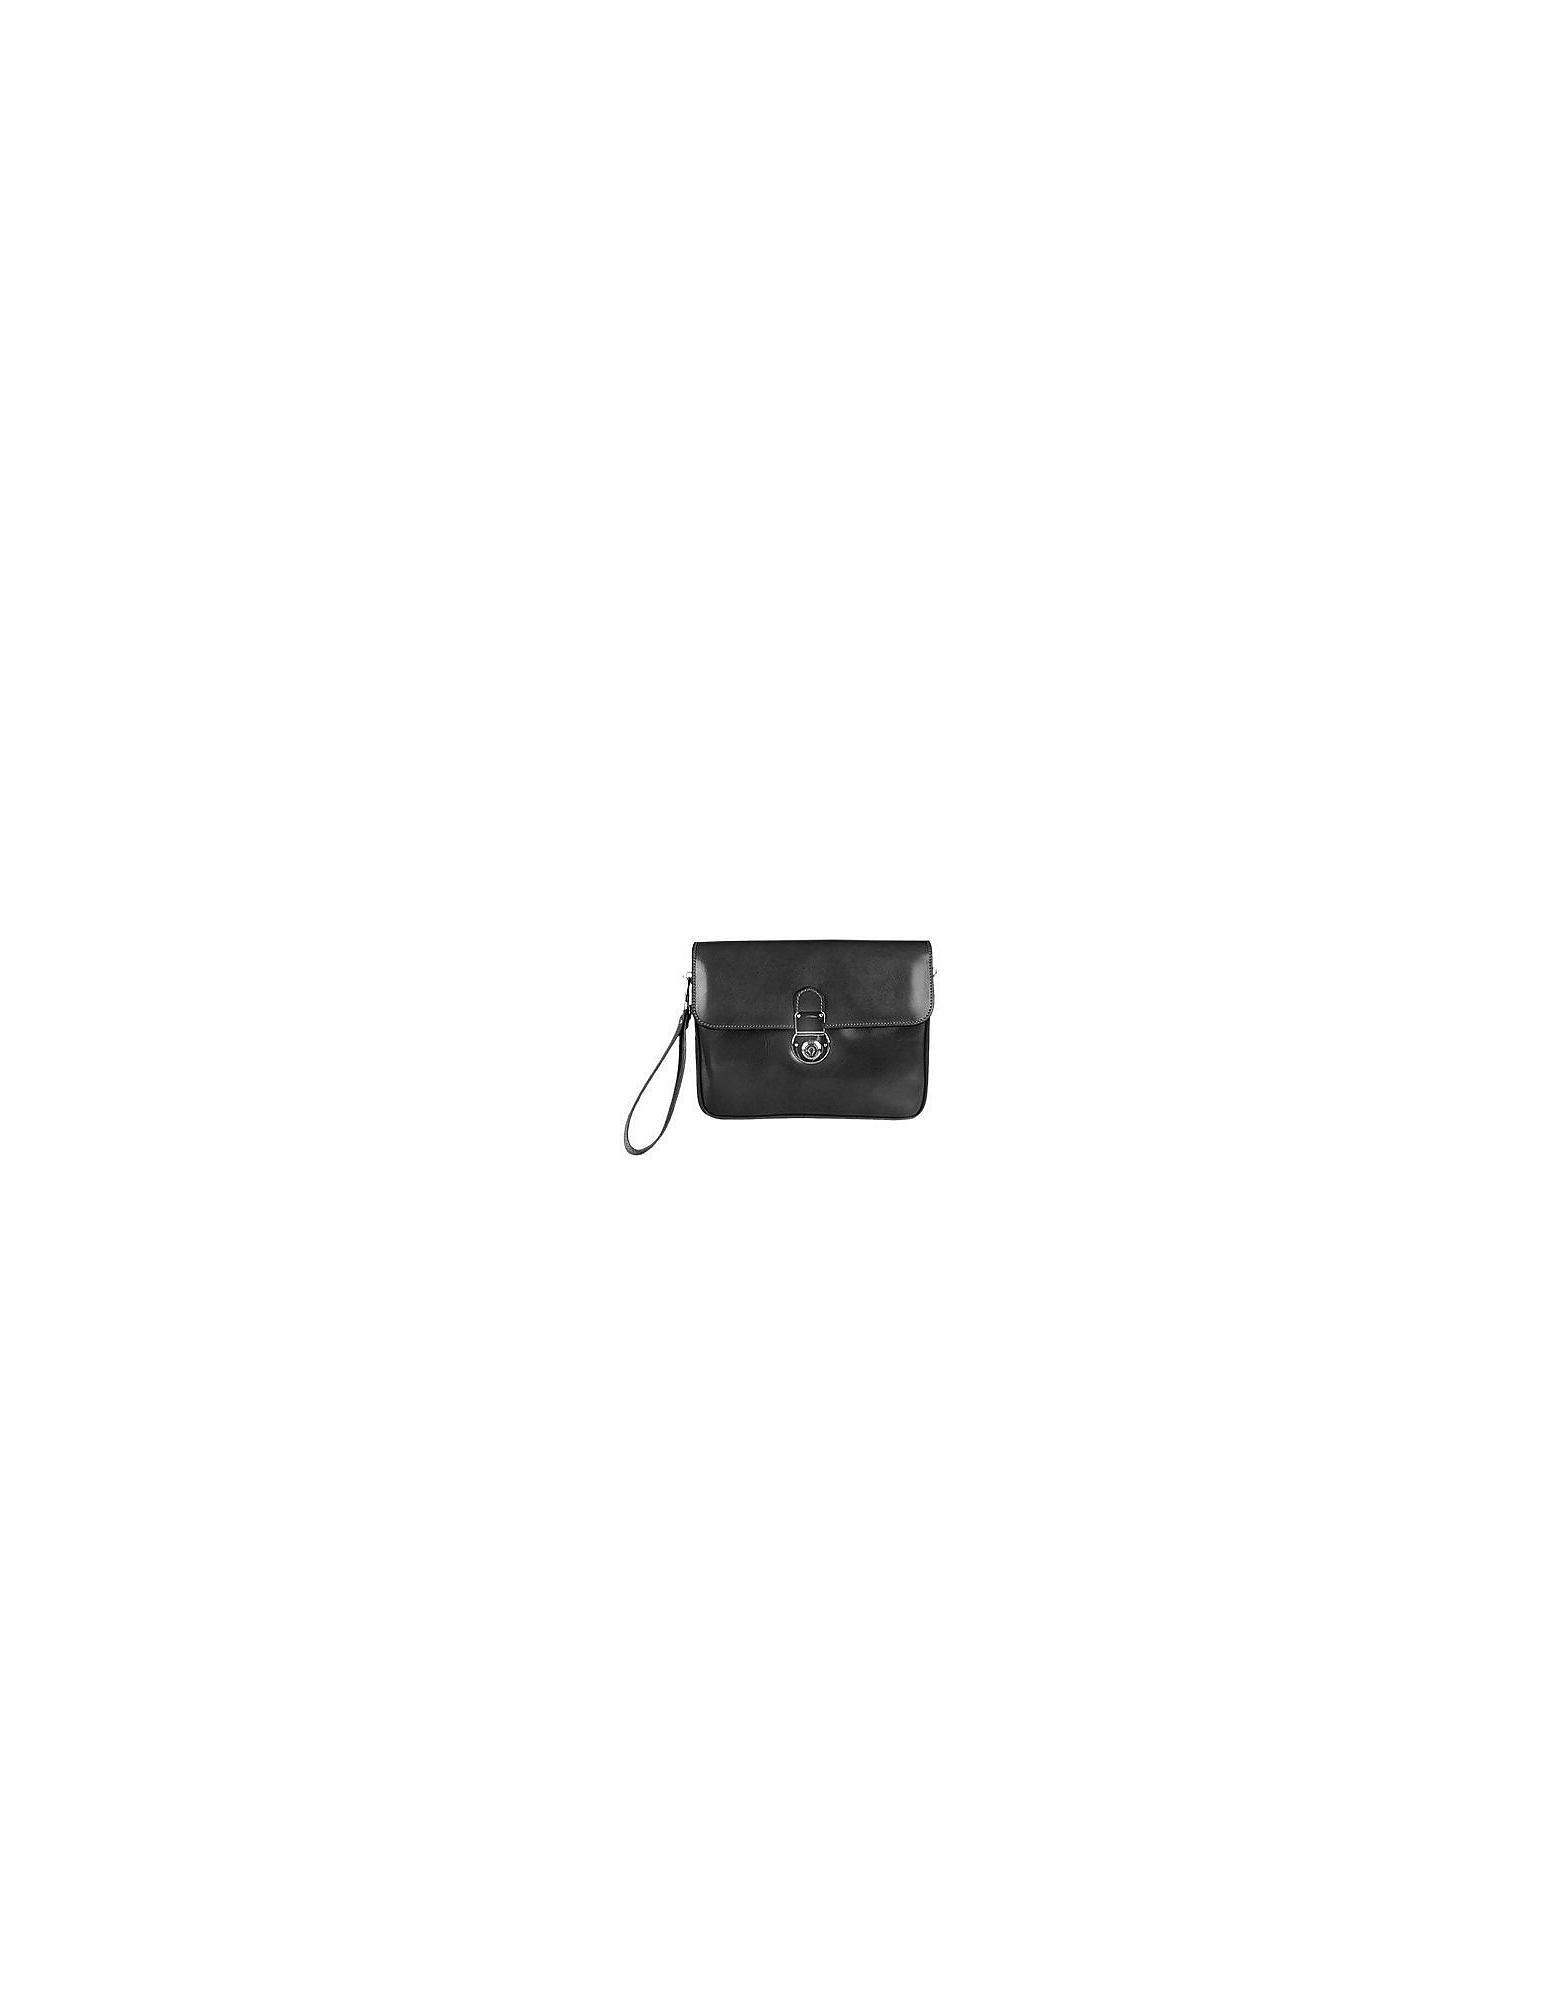 L.A.P.A. Briefcases, Men's Genuine Leather Clutch